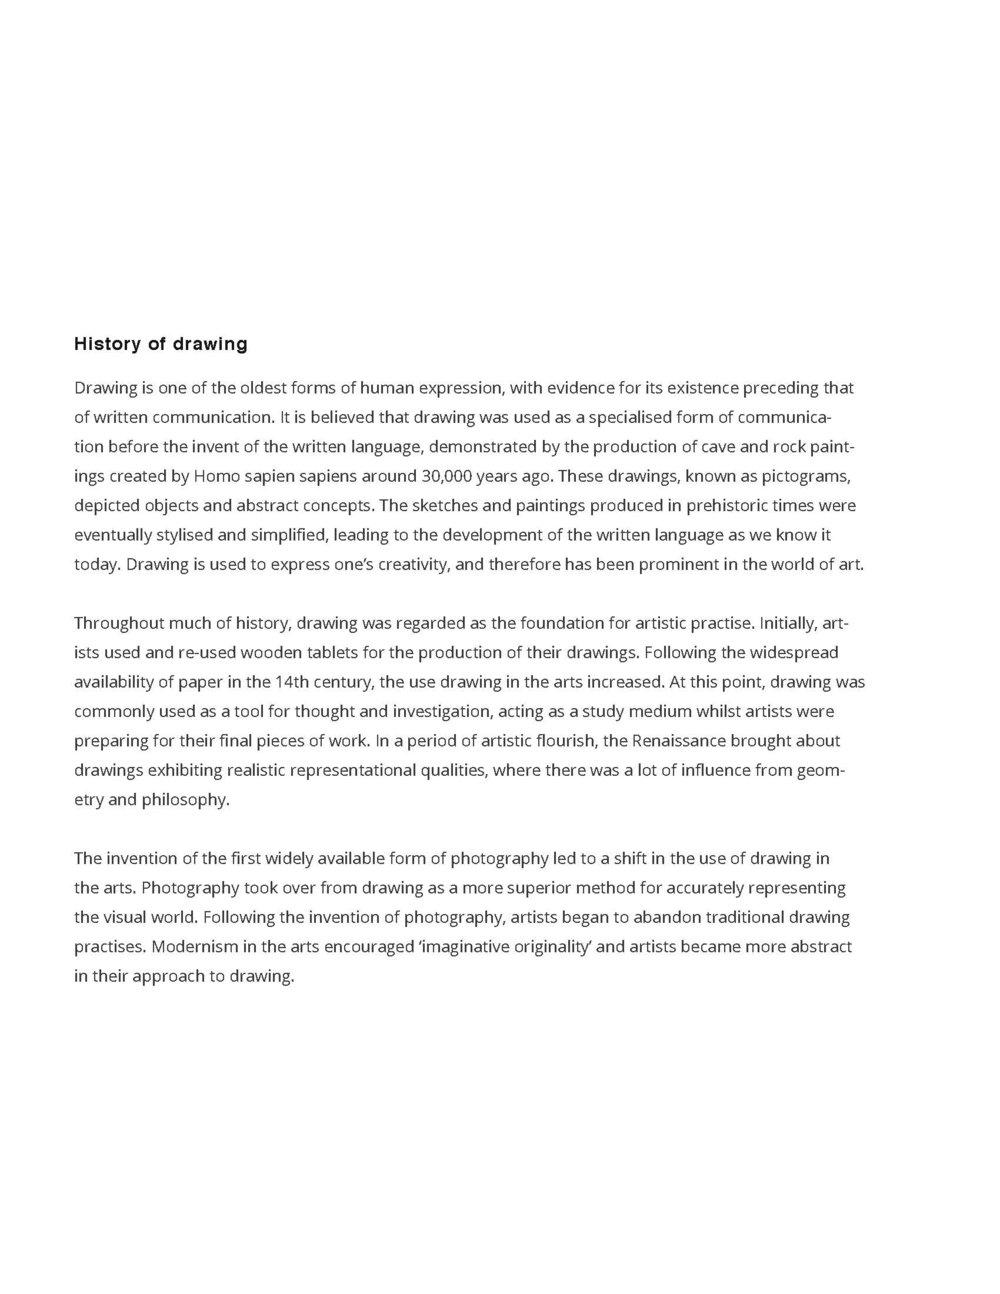 narrative book_Page_11.jpg